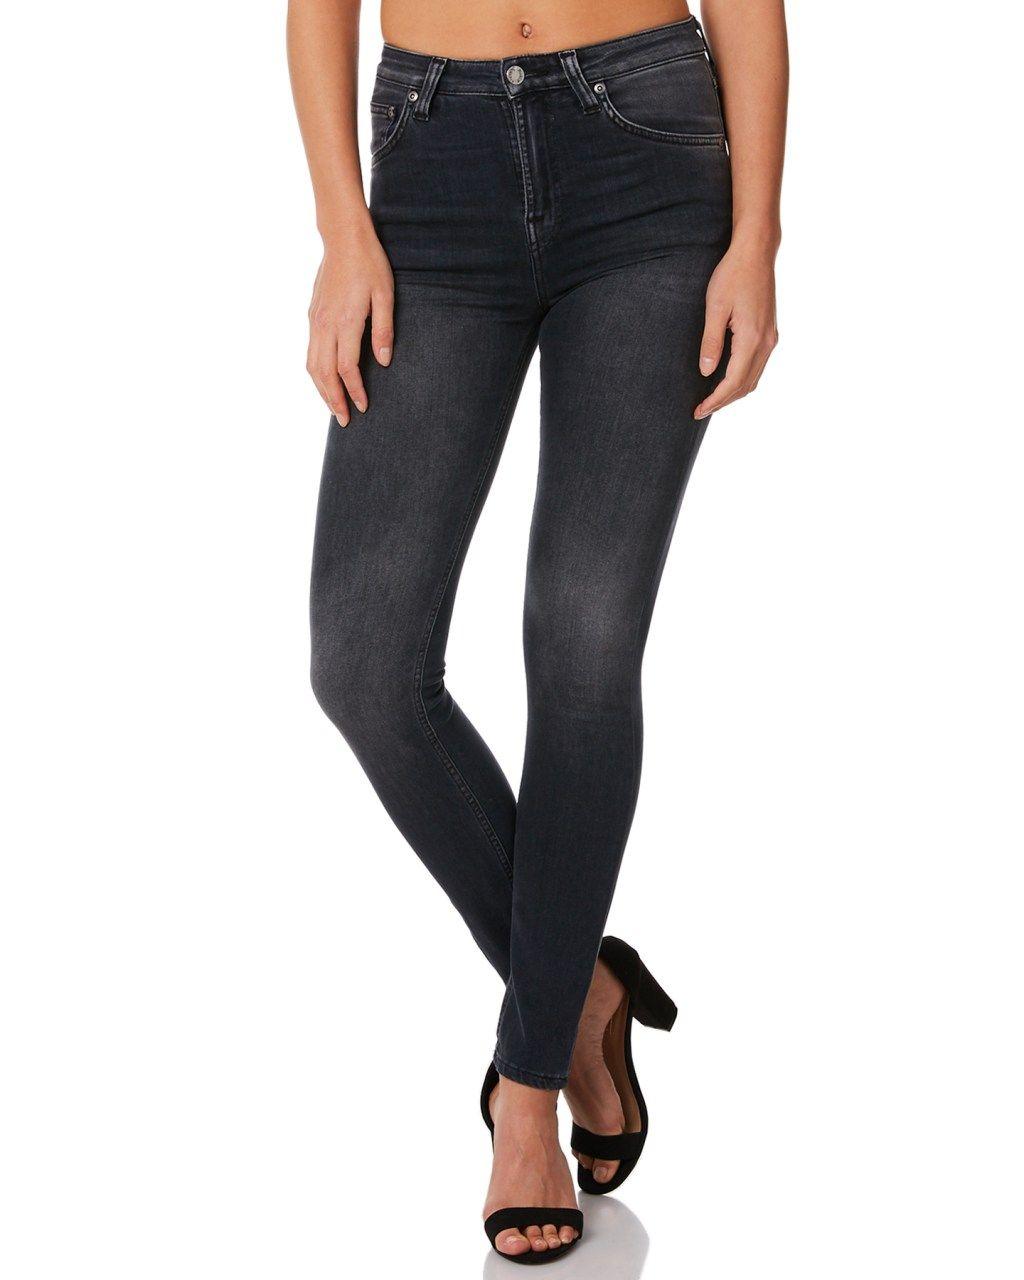 15a0df7b31cc3 Nudie Jeans Co Womens Hightop Tilde Jean Black Movement Womens jeans Size 31